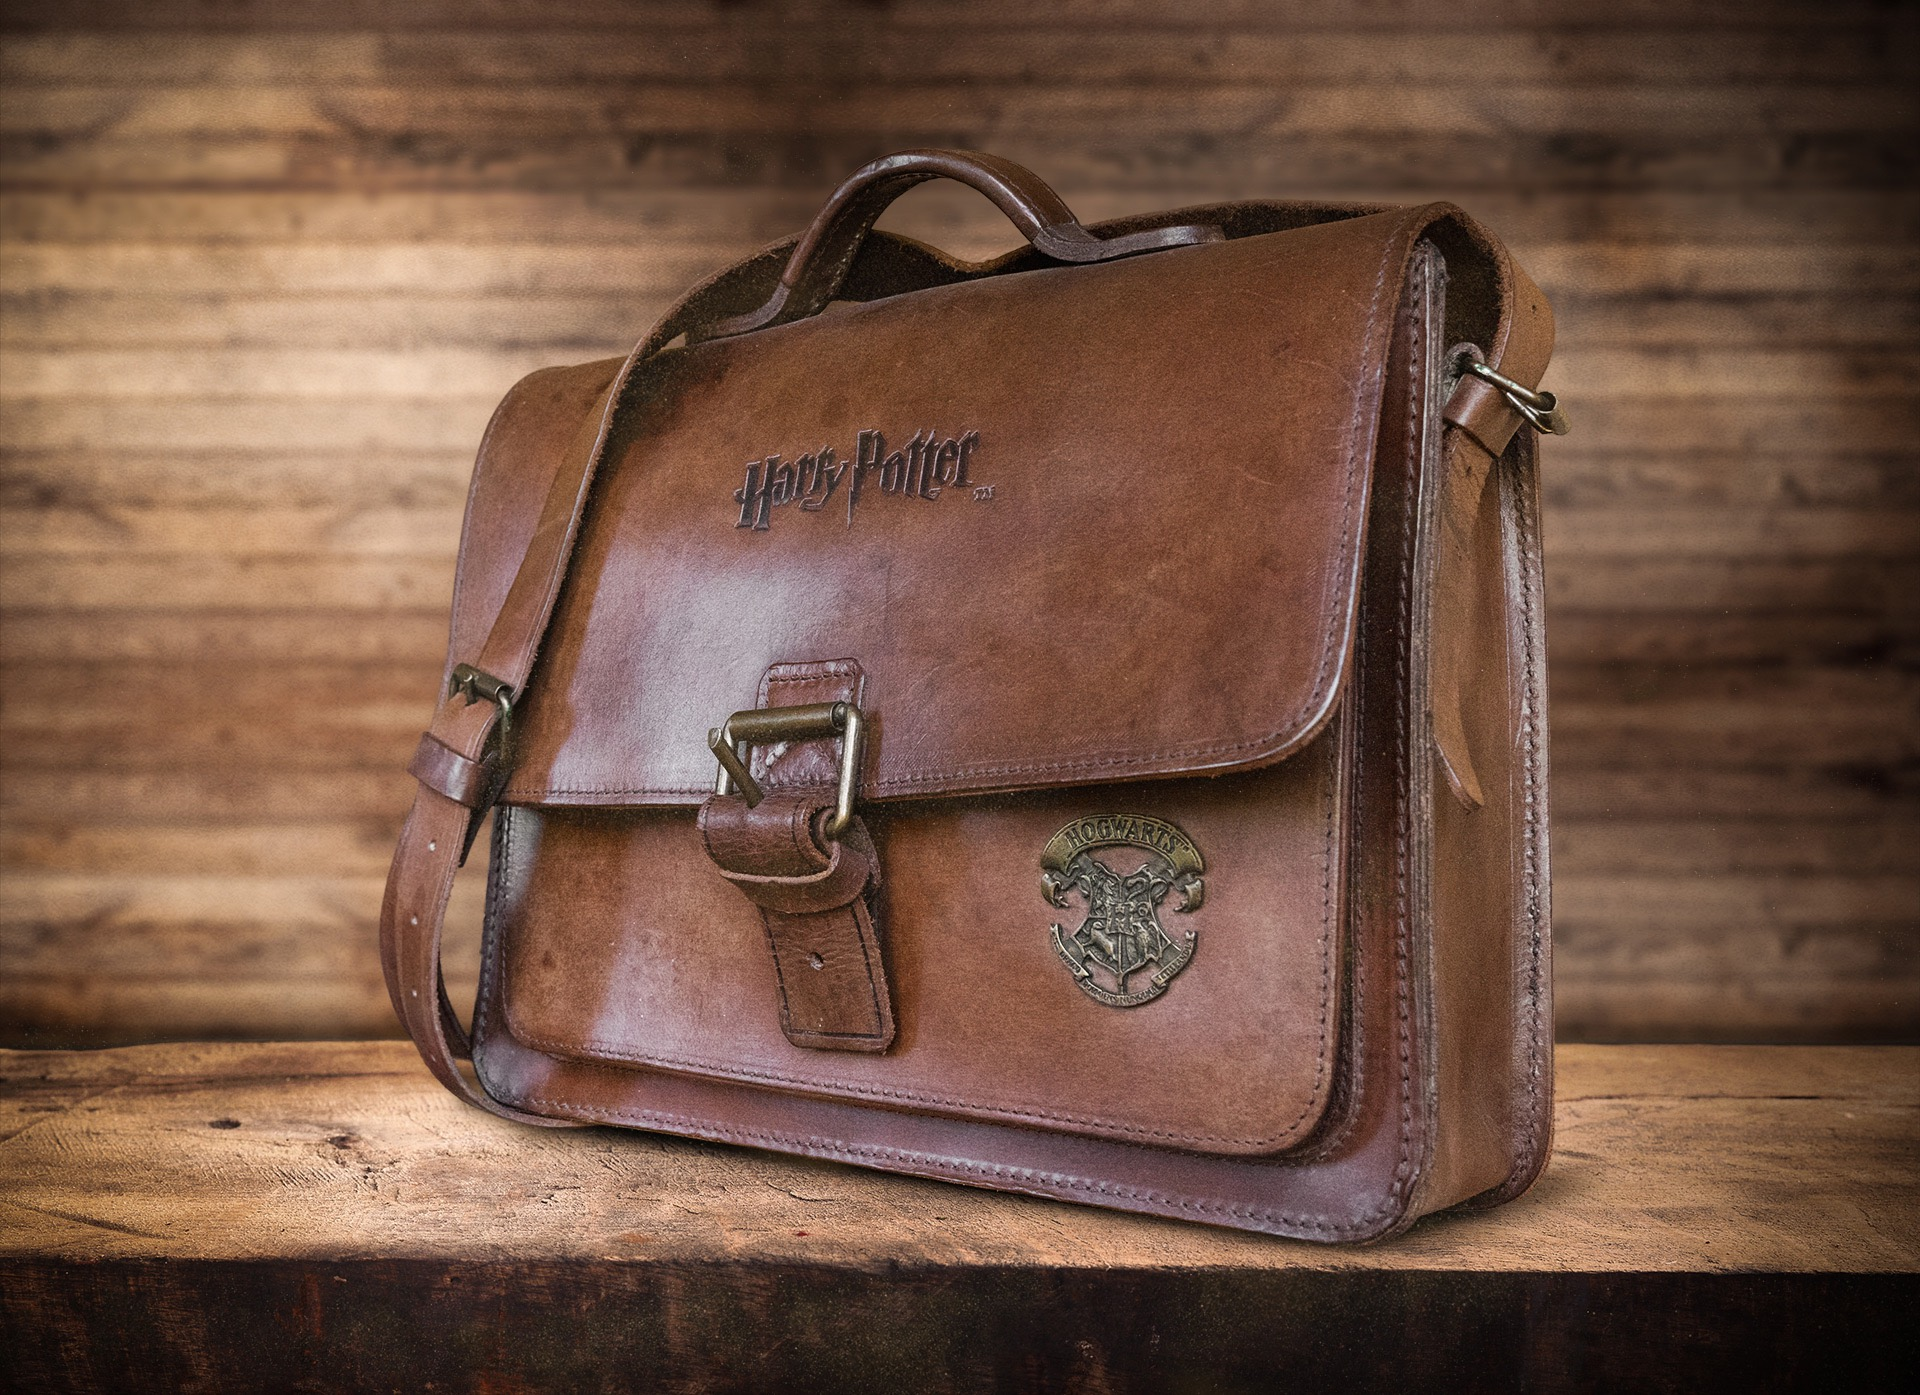 Petit cartable Harry Potter.